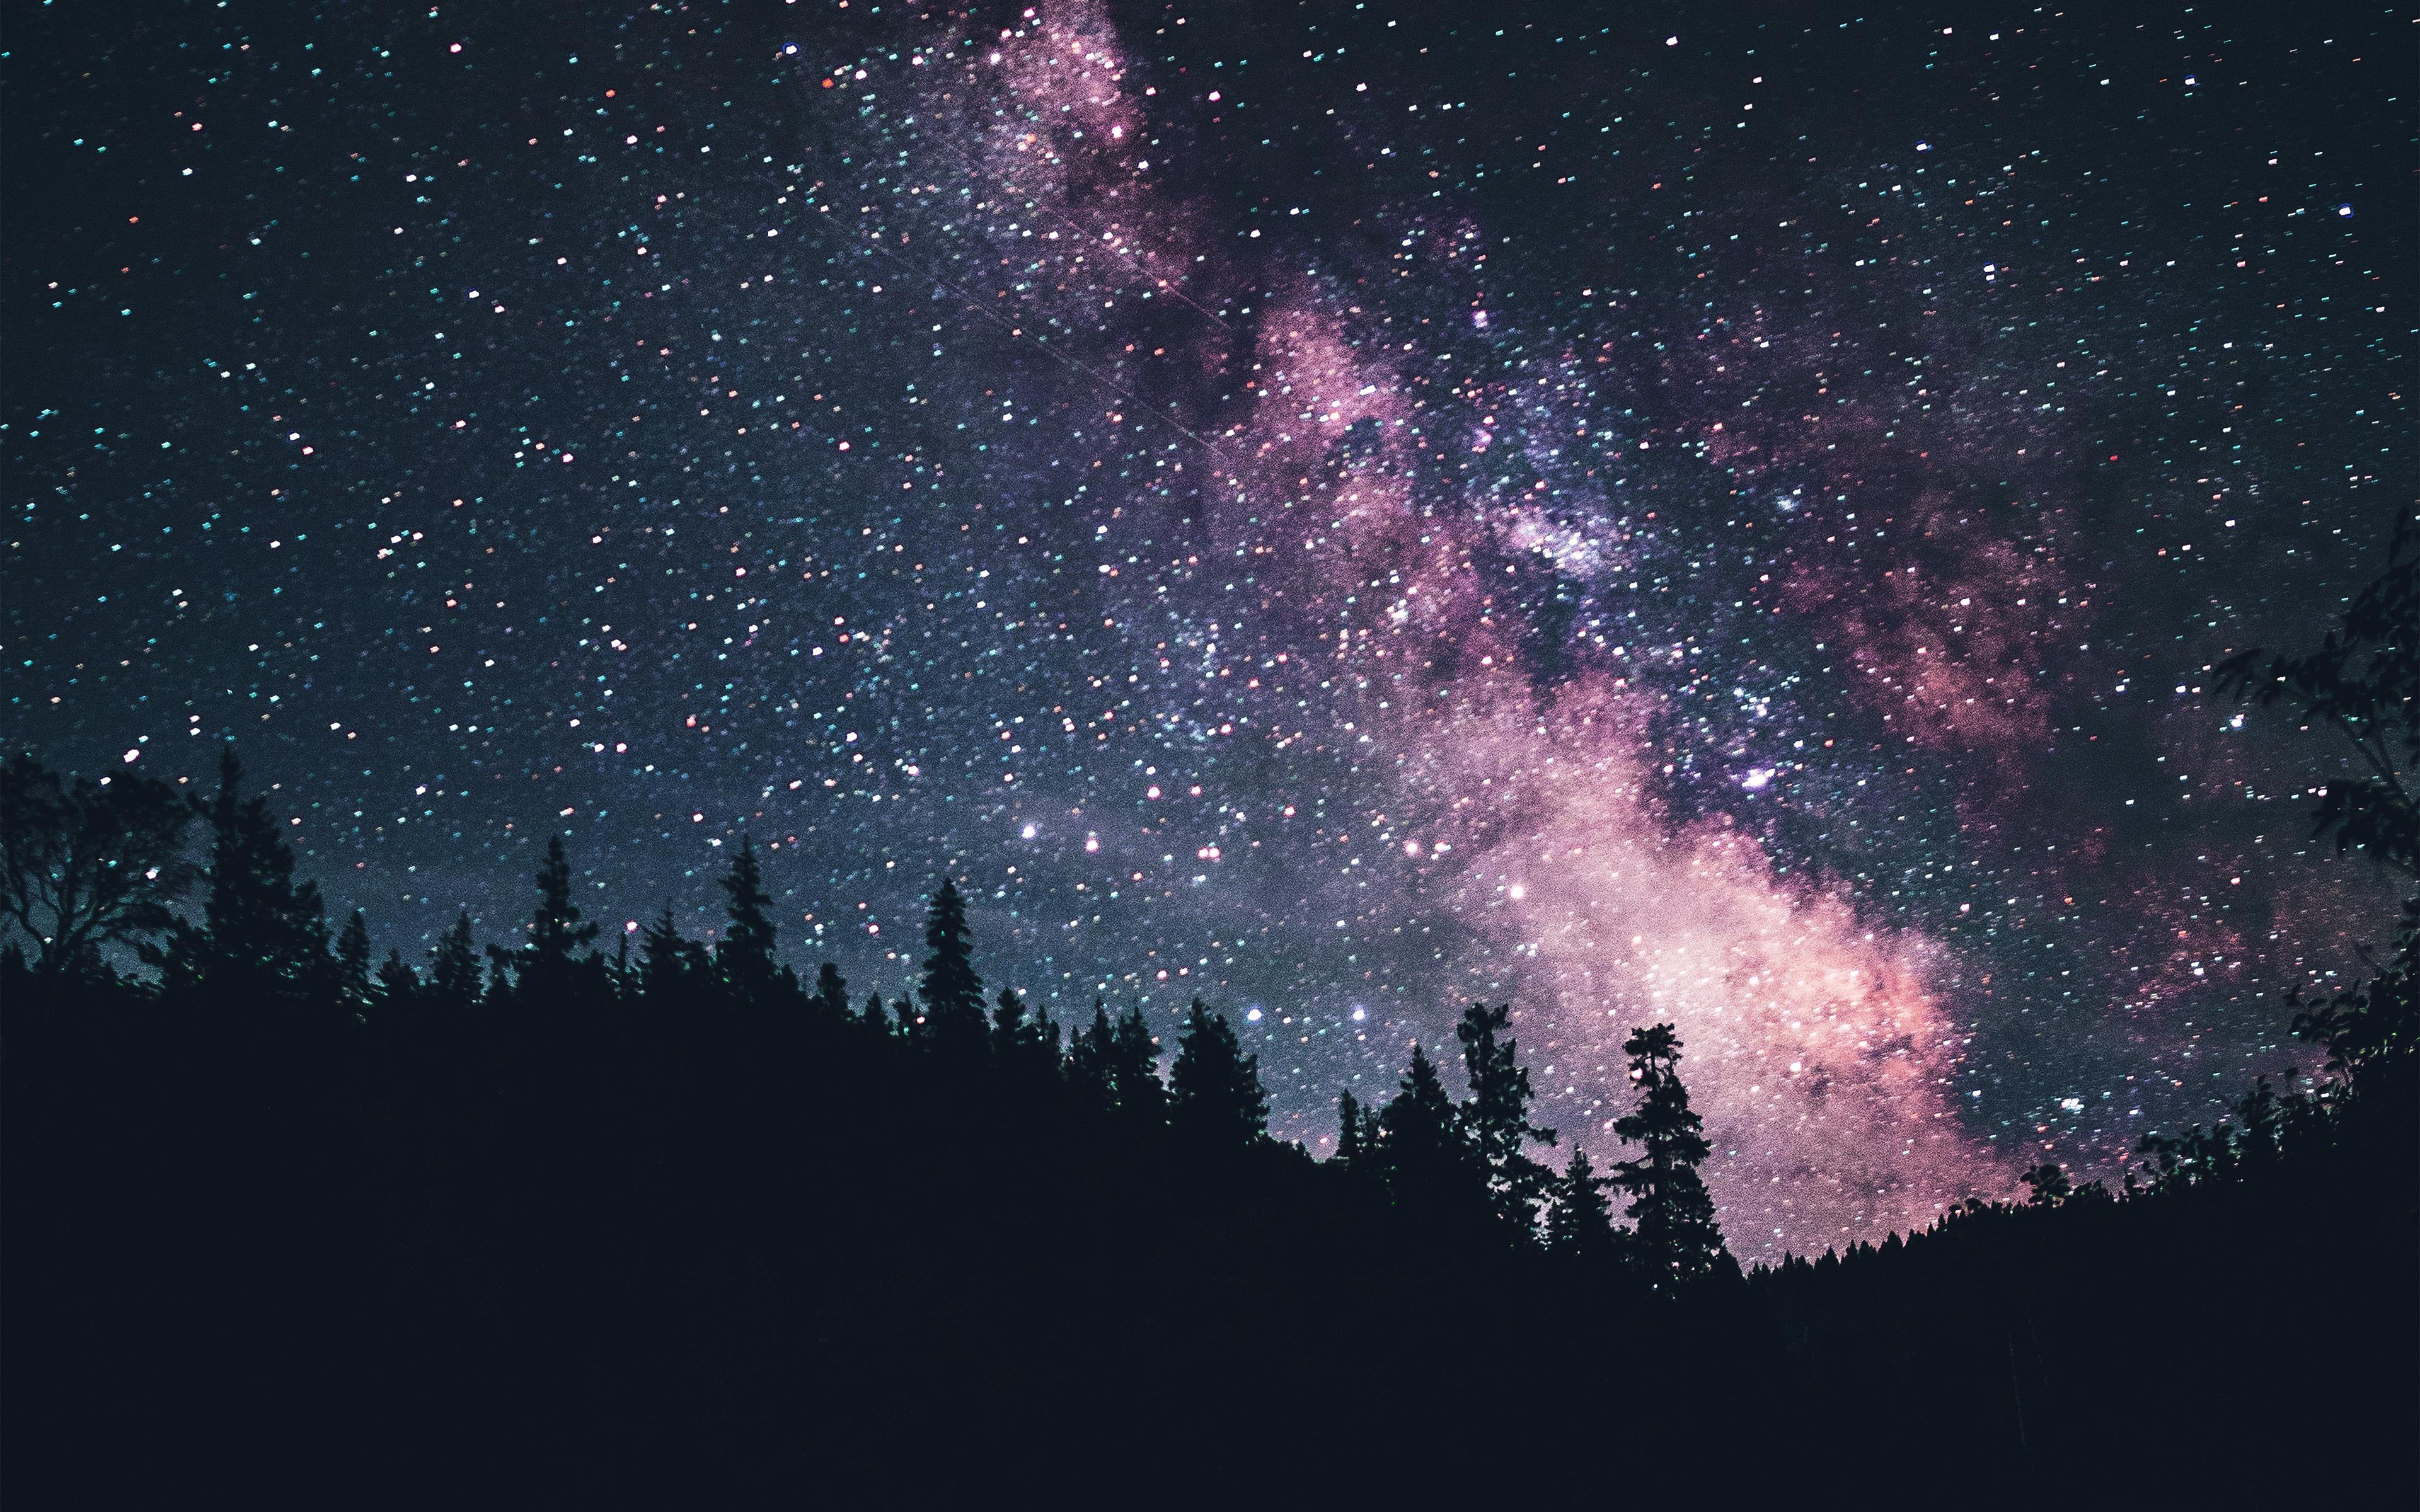 Wallpaper For Desktop Laptop Mx09 Night Sky Dark Green Space Milkyway Star Nature